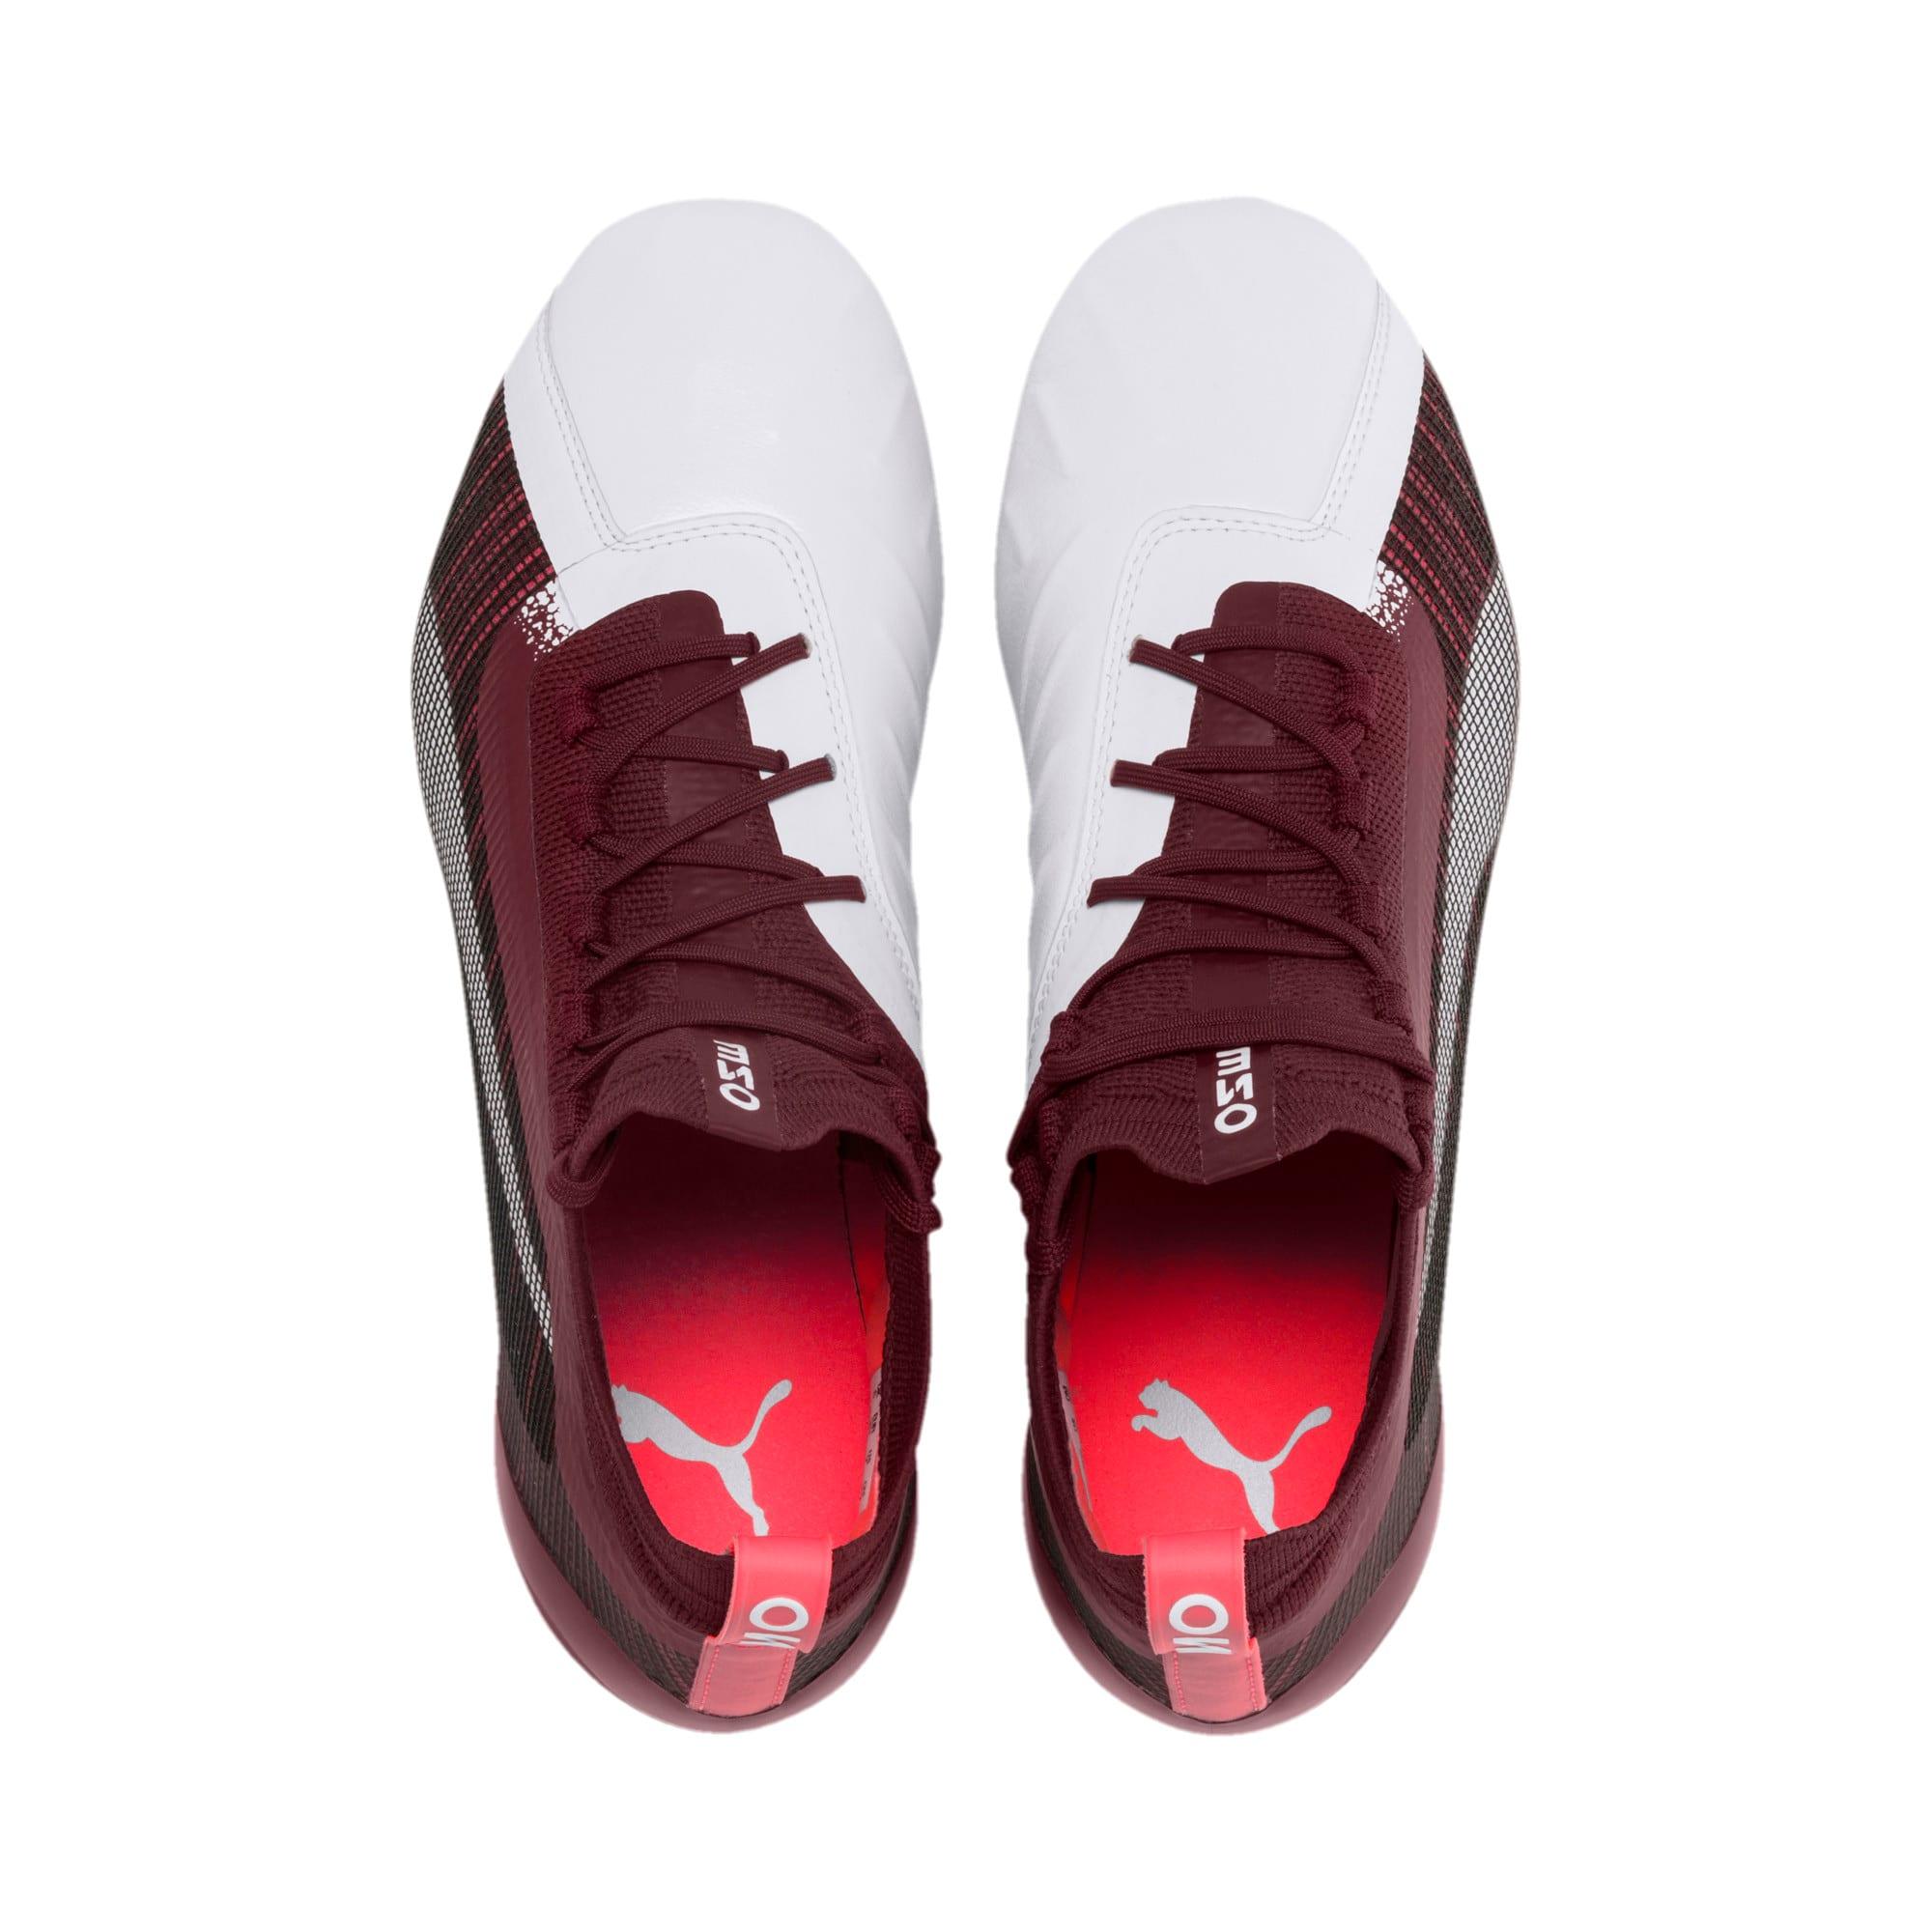 Thumbnail 7 of PUMA ONE 5.1 Women's Football Boots, White-Vineyard Wine-Silver, medium